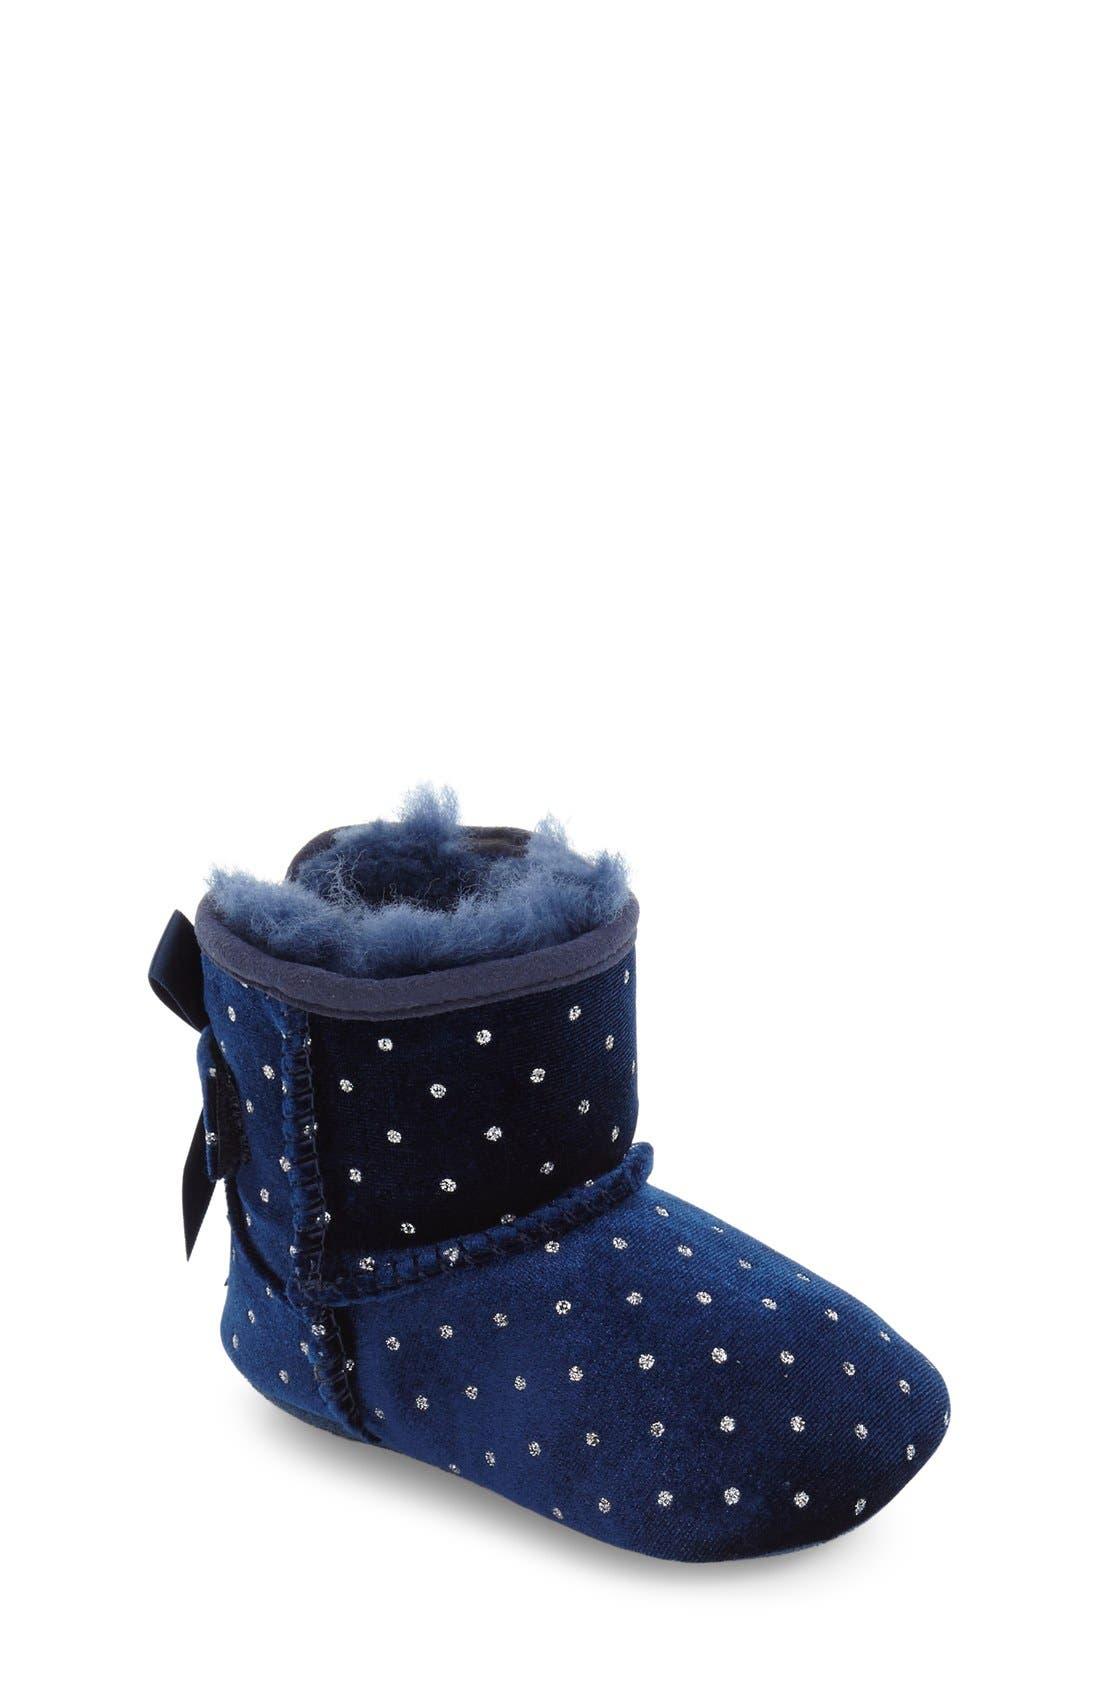 Alternate Image 1 Selected - UGG® Jesse Bow Boot (Baby & Walker)